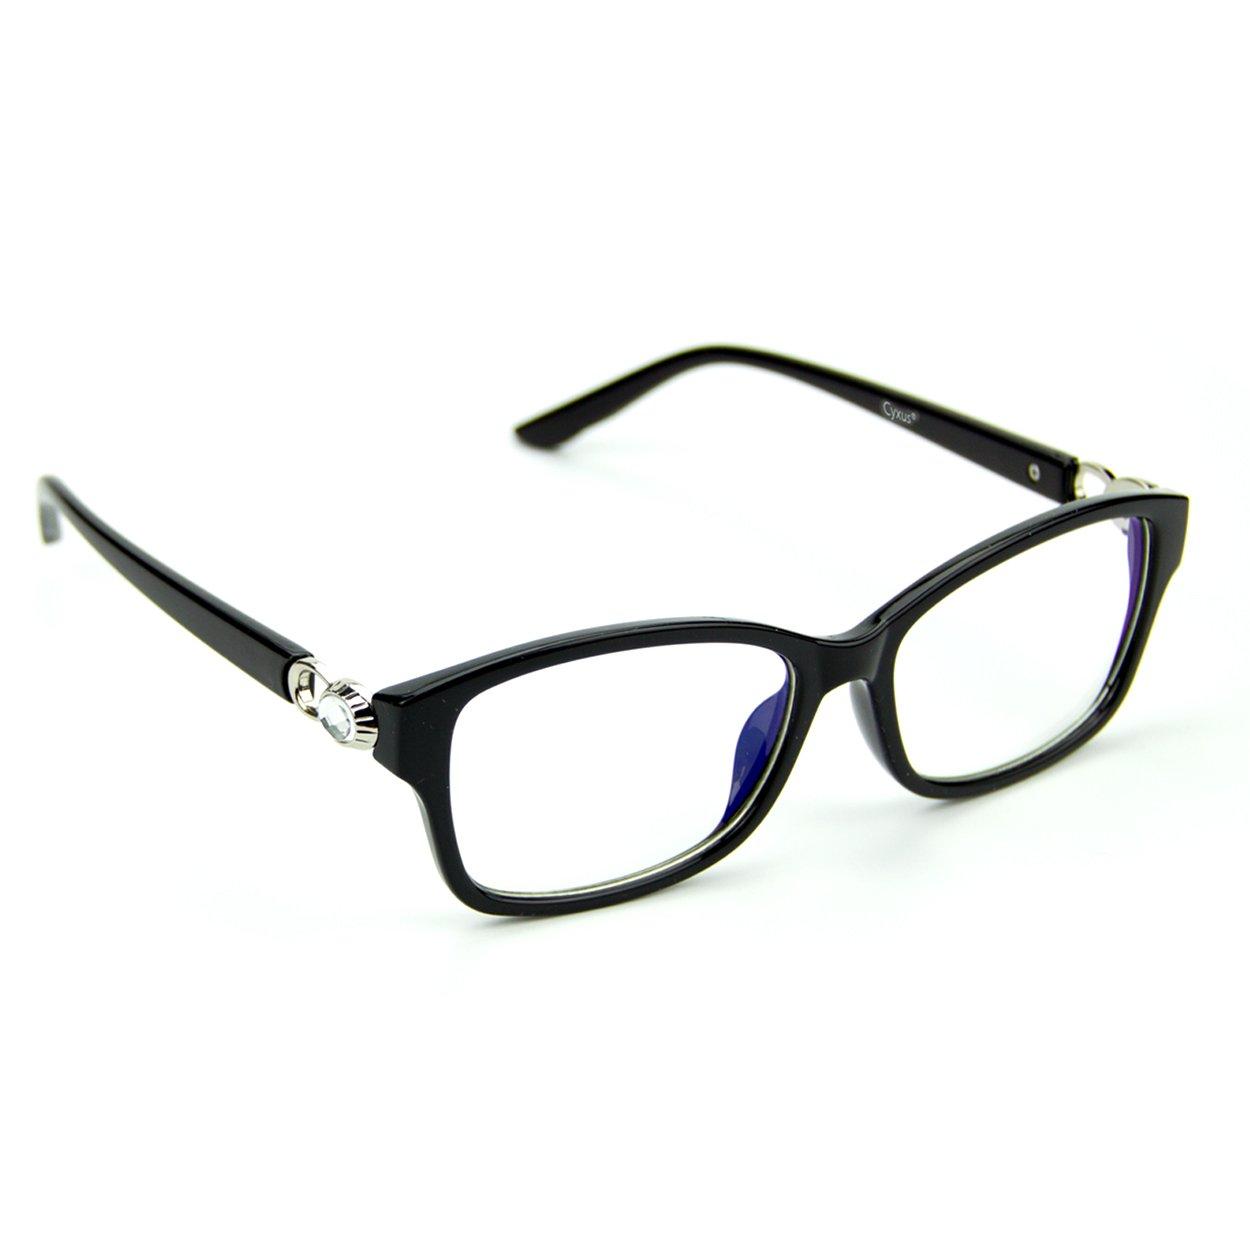 Cyxus Blue Light Filter (Transparent Lens) Anti Eyestrain Headache Vision Protection Computer Glasses Cyxus Technology Group Ltd